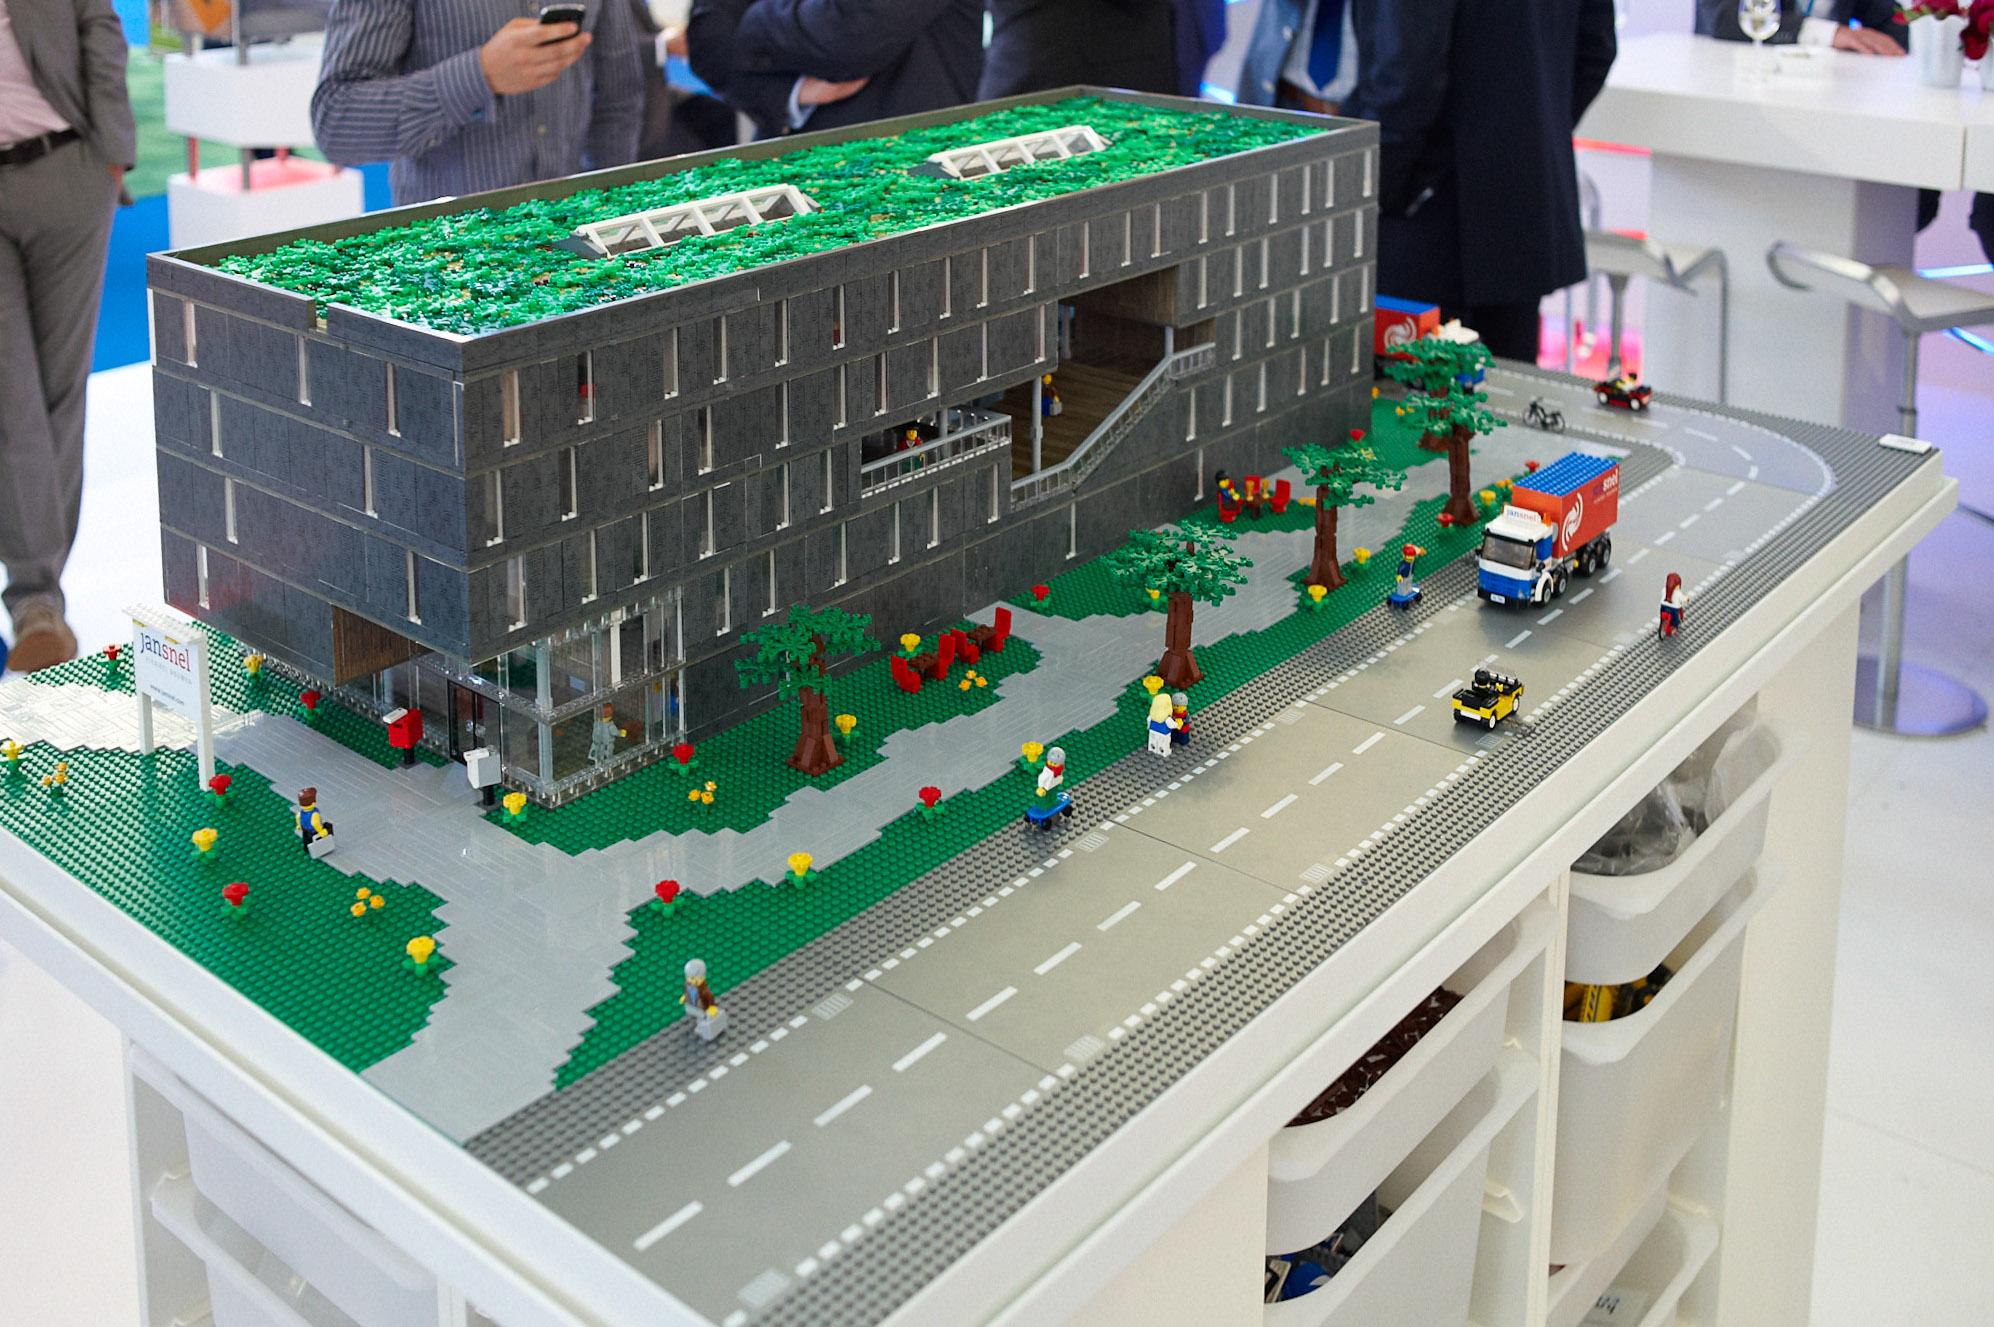 Lego Maquette Jan Snel 1